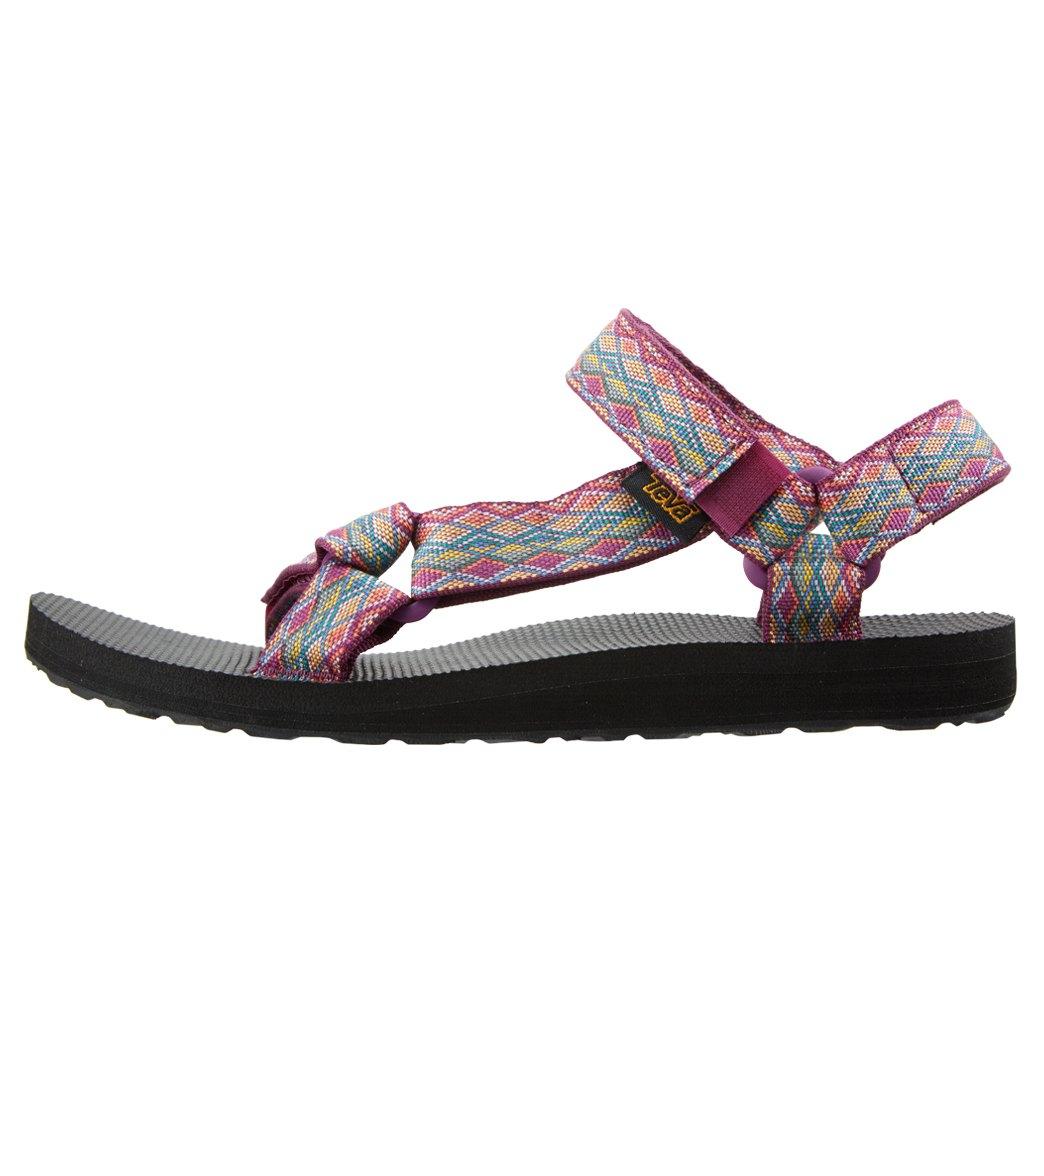 d6fad10aab7780 Teva Women s Original Universal Sandal at SwimOutlet.com - Free Shipping